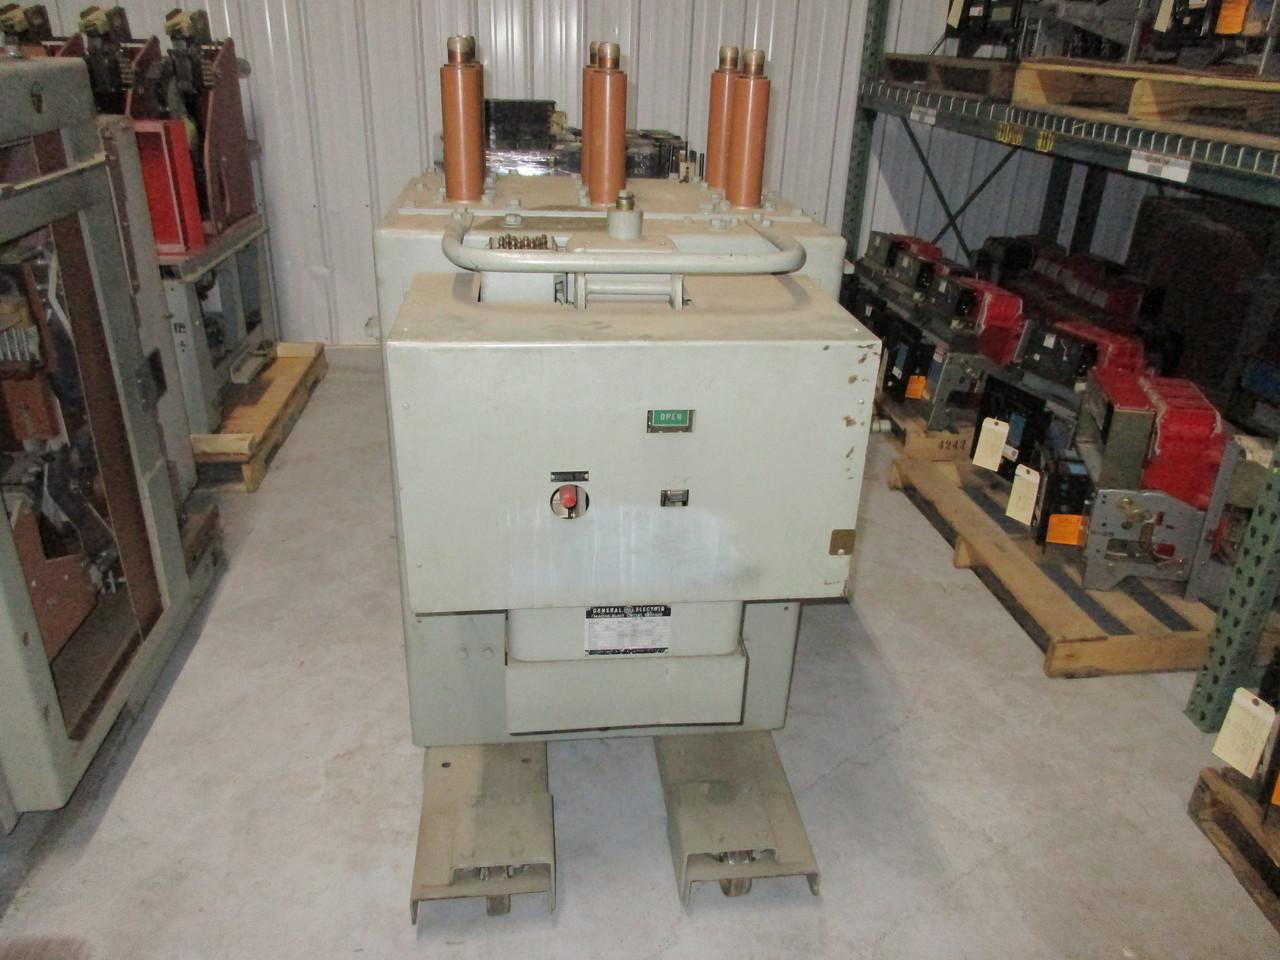 Ge Magnablast Circuit Breaker Wiring Diagram Search For Air Am 13 8 250 2 Magne Blast 1200a 15kv Rh Bullockbreakers Com Magna